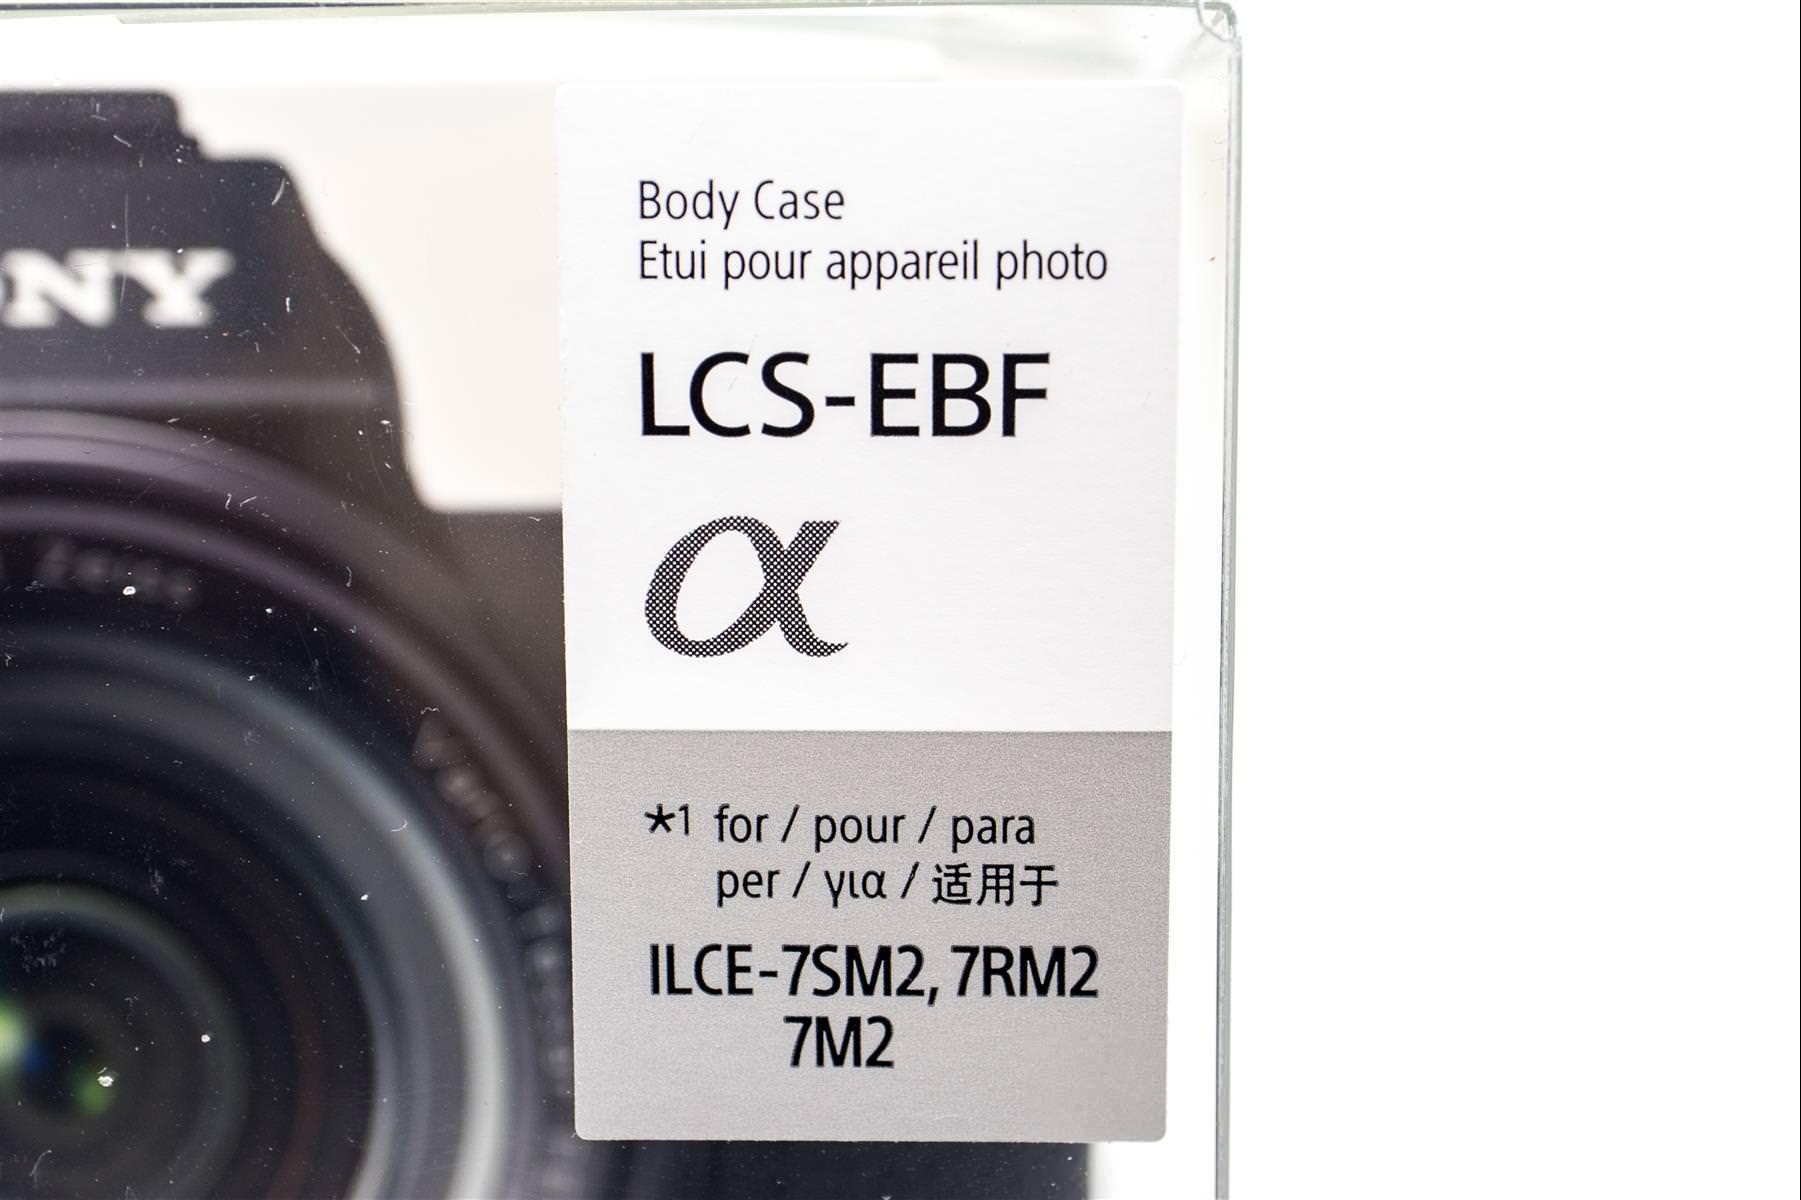 LCS-EBF